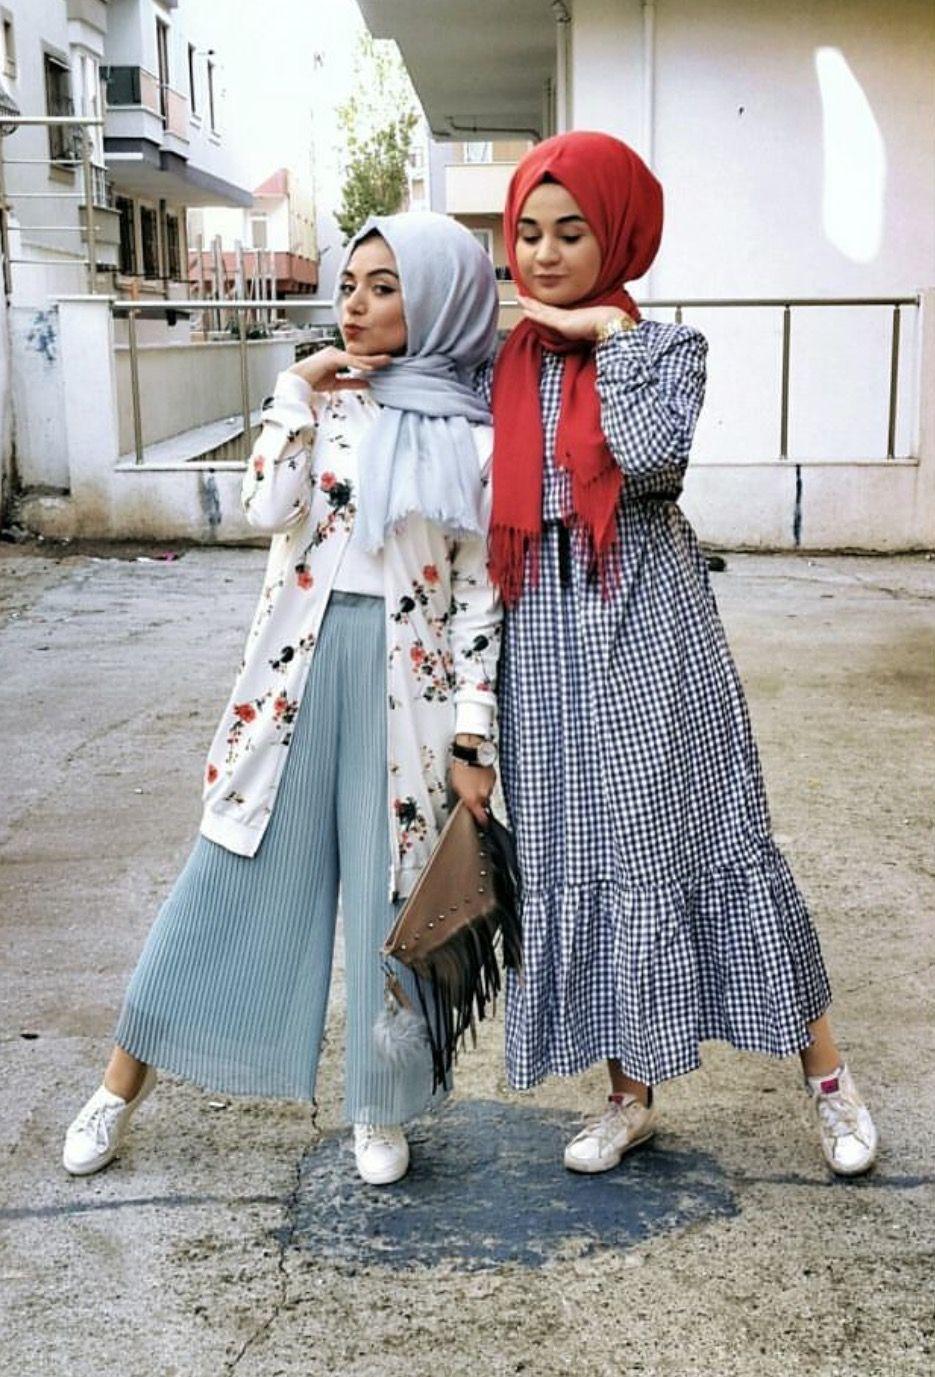 Photo Desain Baju Hijab Style | Kerabatdesain